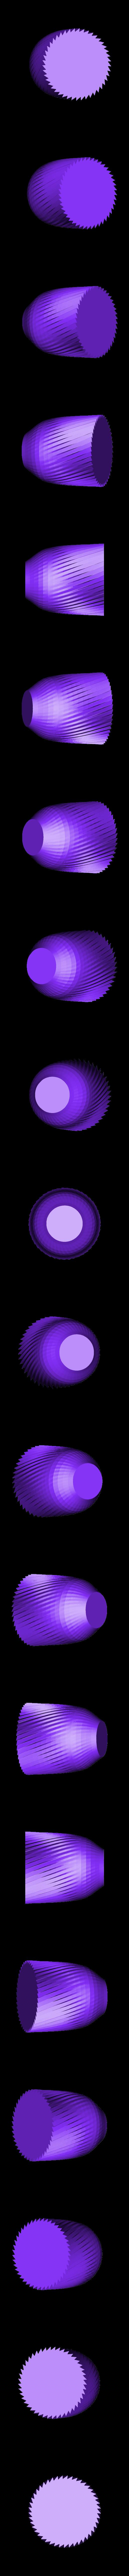 BuzzCup.stl Download free STL file Buzzsaw Vases • Model to 3D print, Revalia6D